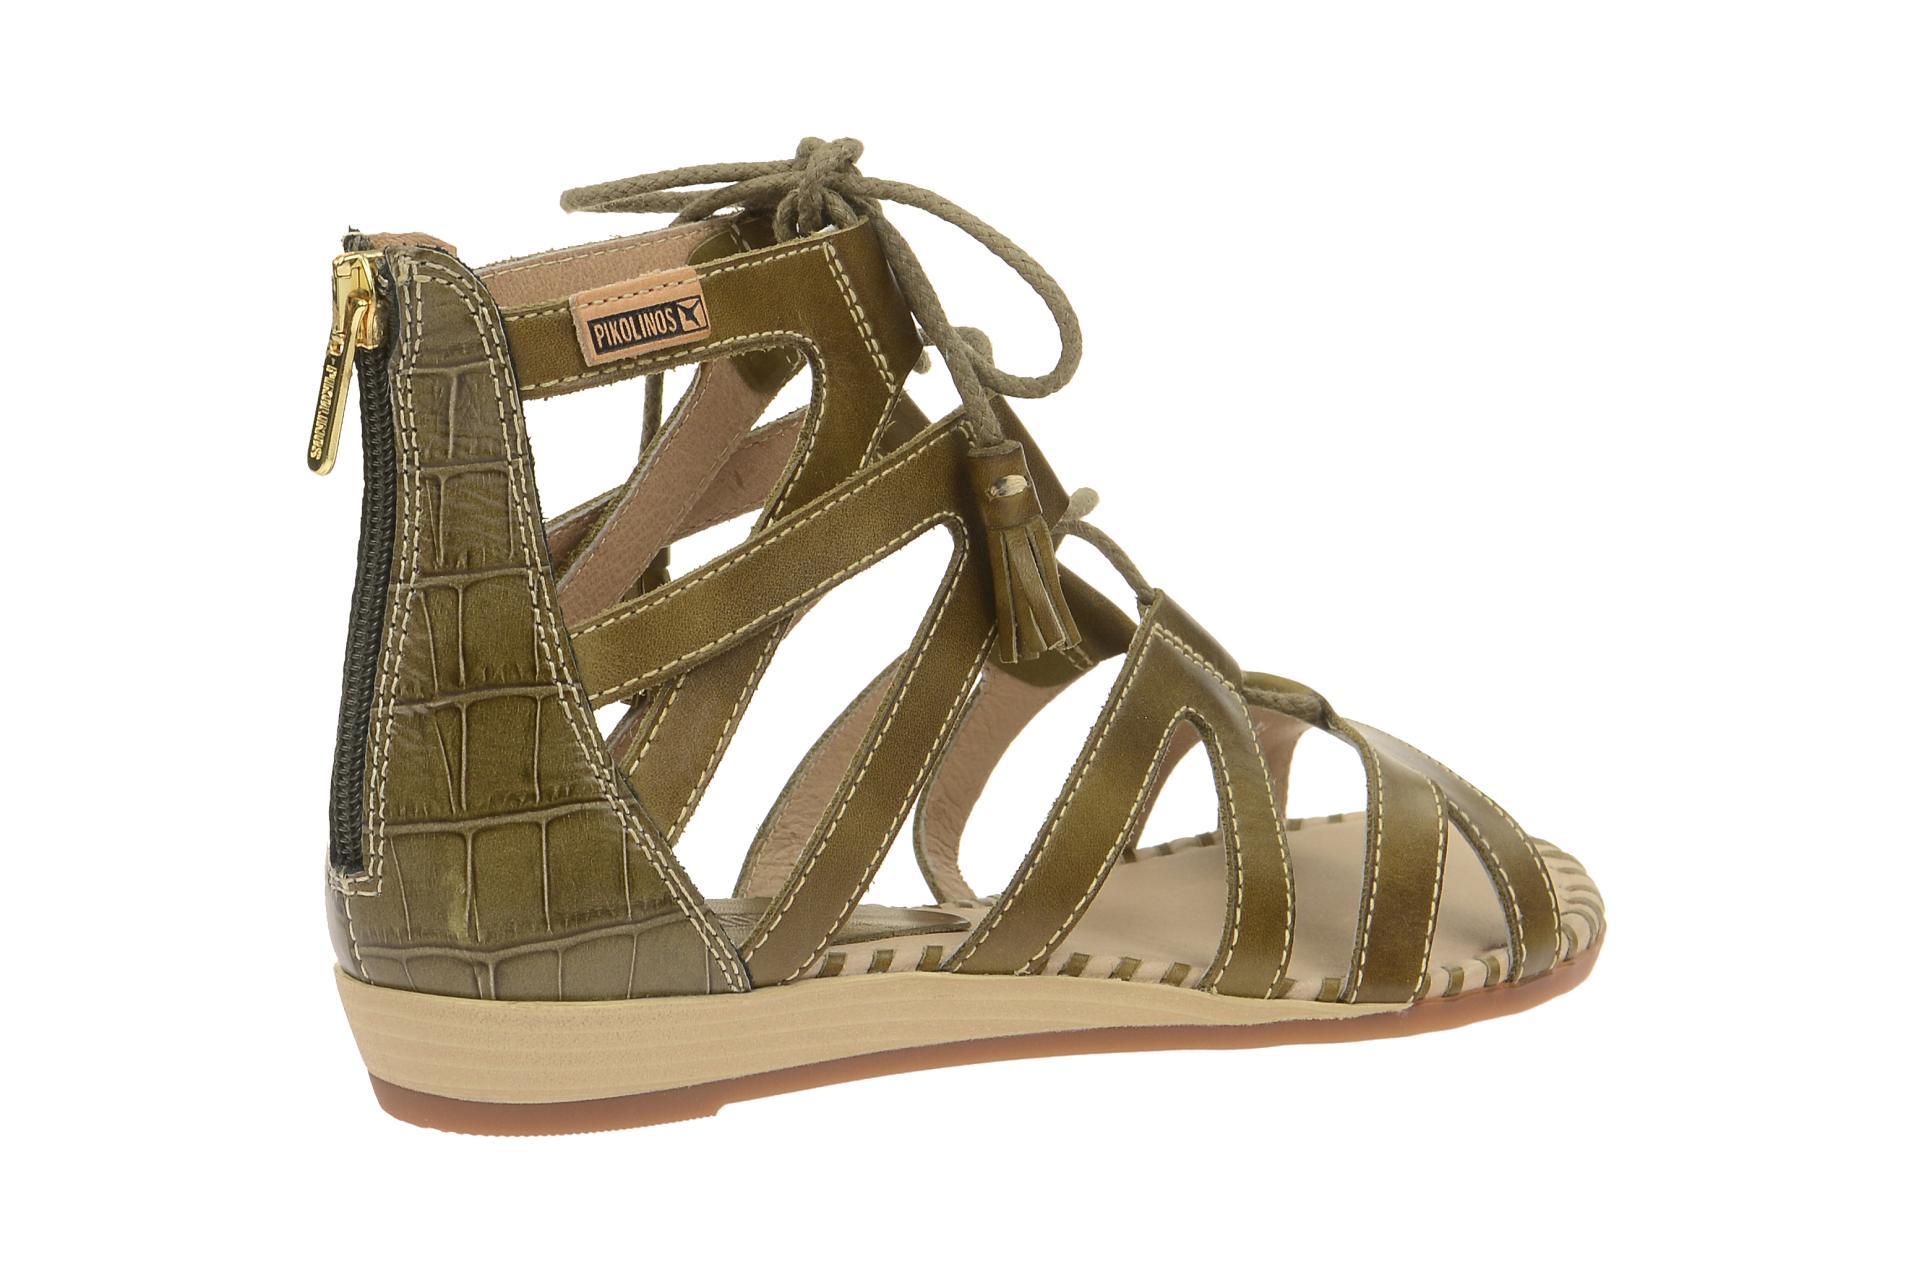 pikolinos schuhe alcudia gr n damen sandalette riemchen sandalen 816 7585 olive ebay. Black Bedroom Furniture Sets. Home Design Ideas